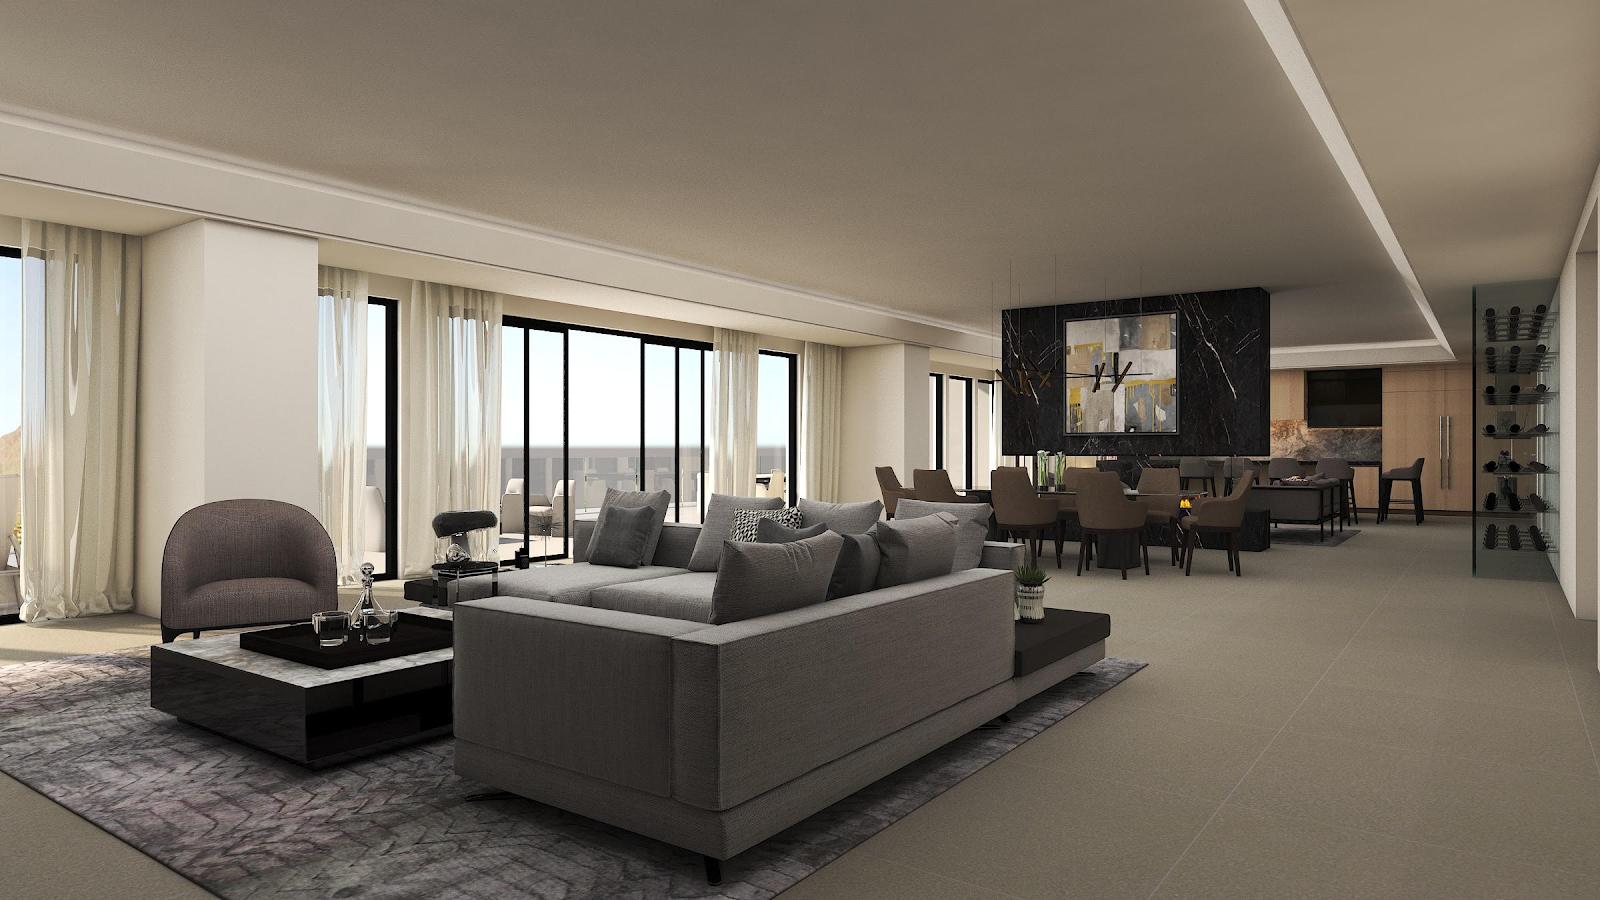 Irene Catsibris Clary on SOHO Scottsdale's Latest Luxury Townhomes, Penthouses & Lofts